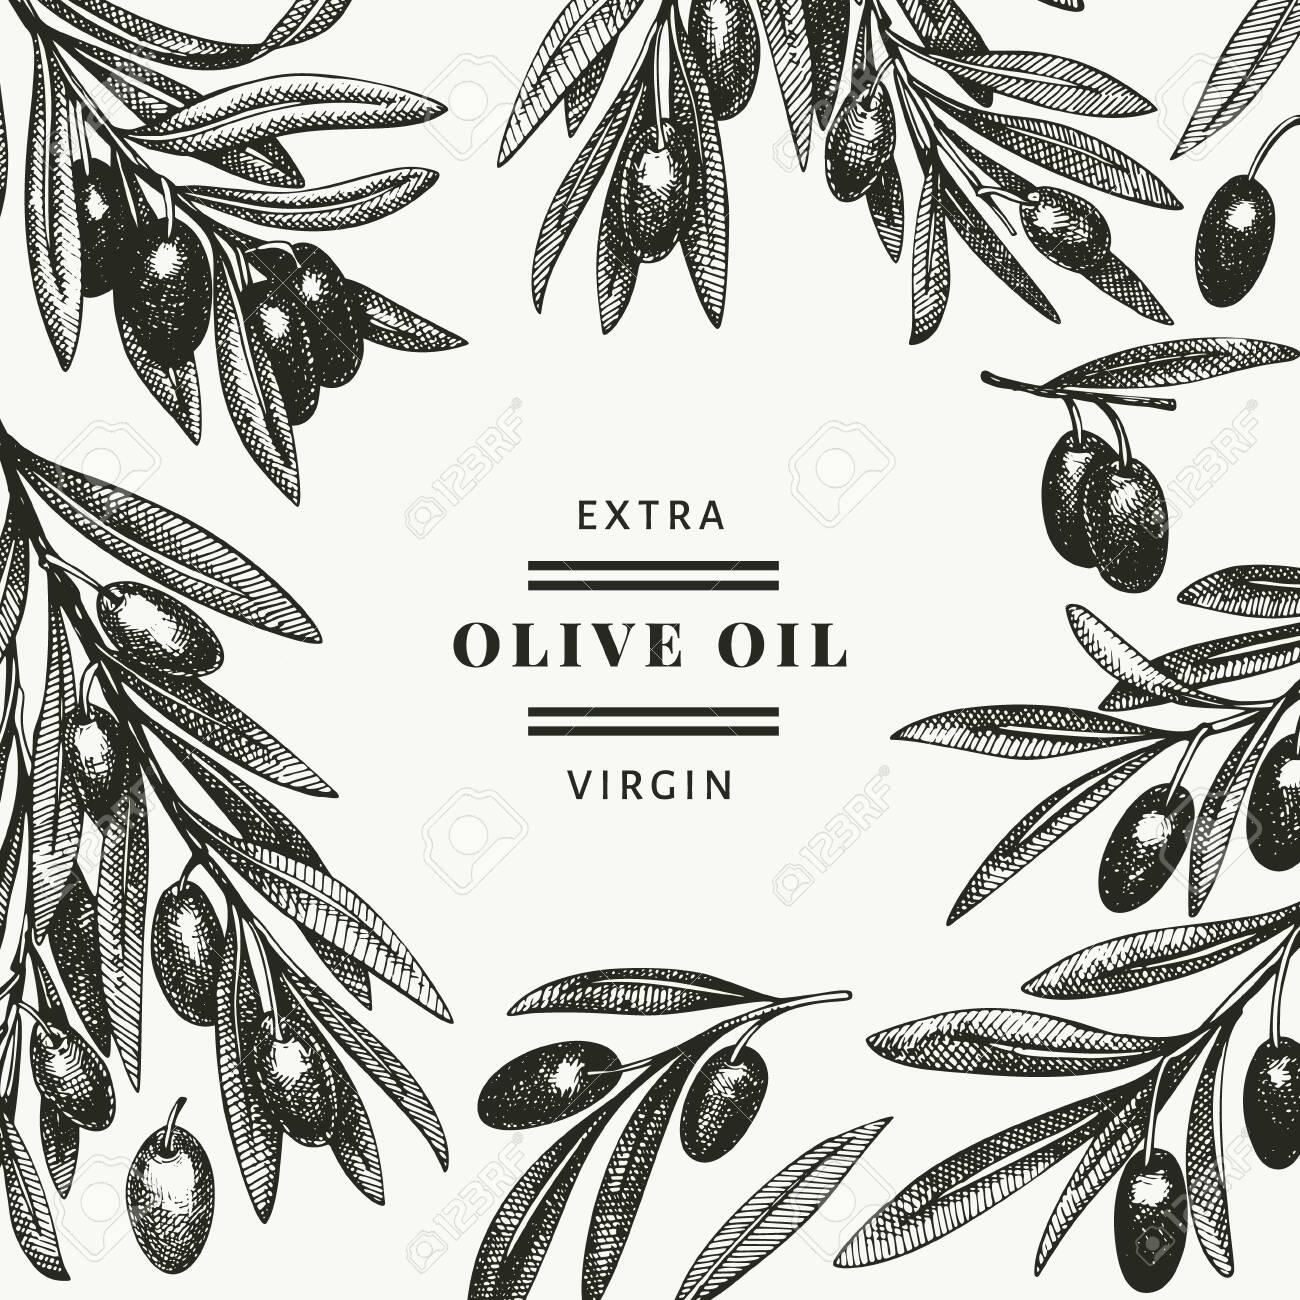 Olive branch design template. Hand drawn vector food illustration. Engraved style mediterranean plant. Vintage botanical picture. - 140901997